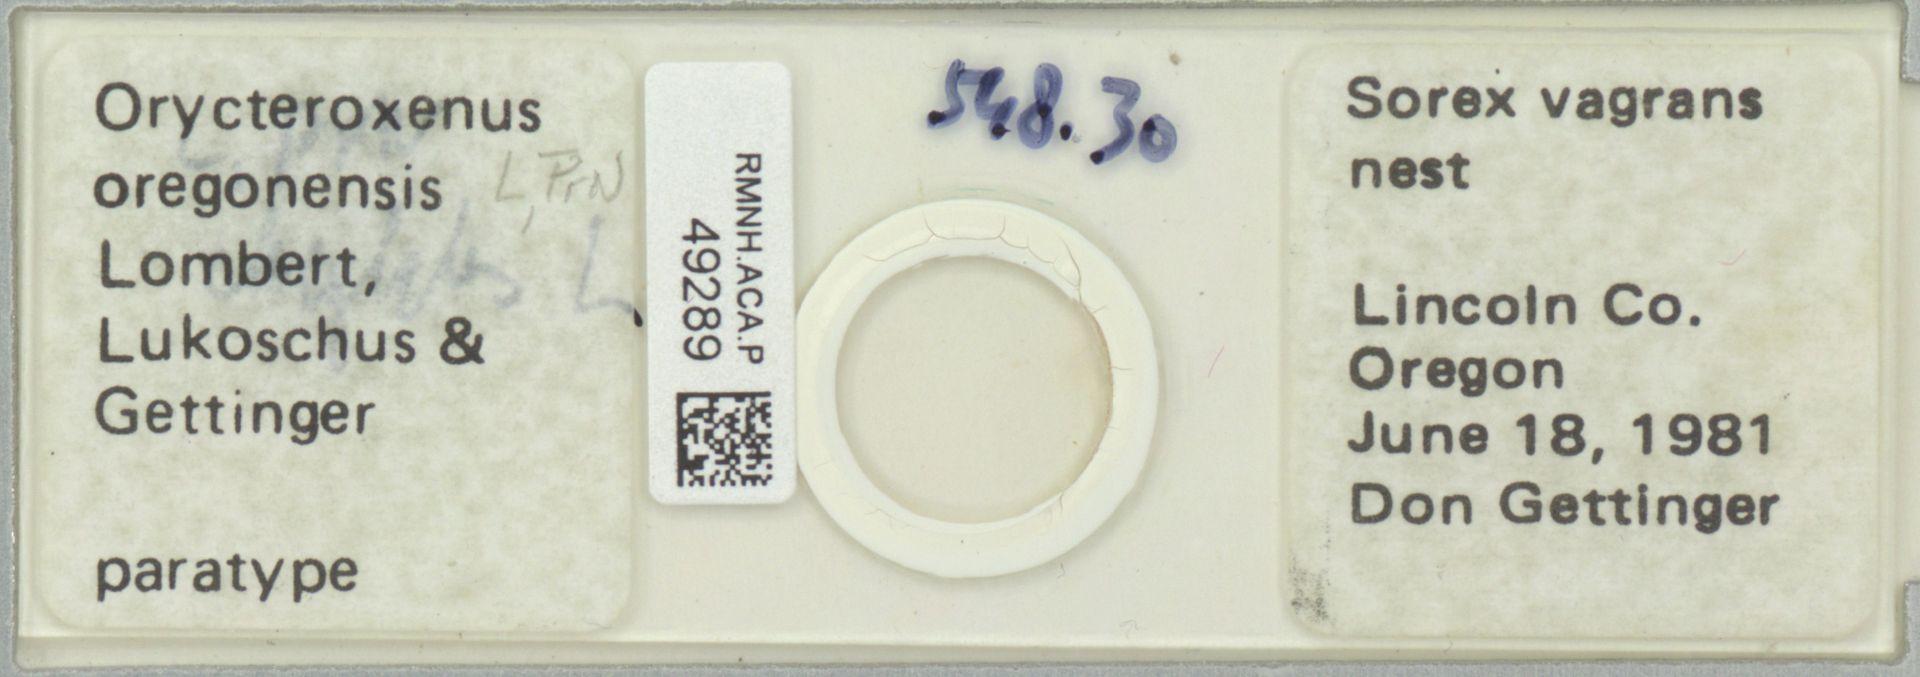 RMNH.ACA.P.49289 | Orycteroxenus oregonensis Lombert, Lukoschus & Gettinger